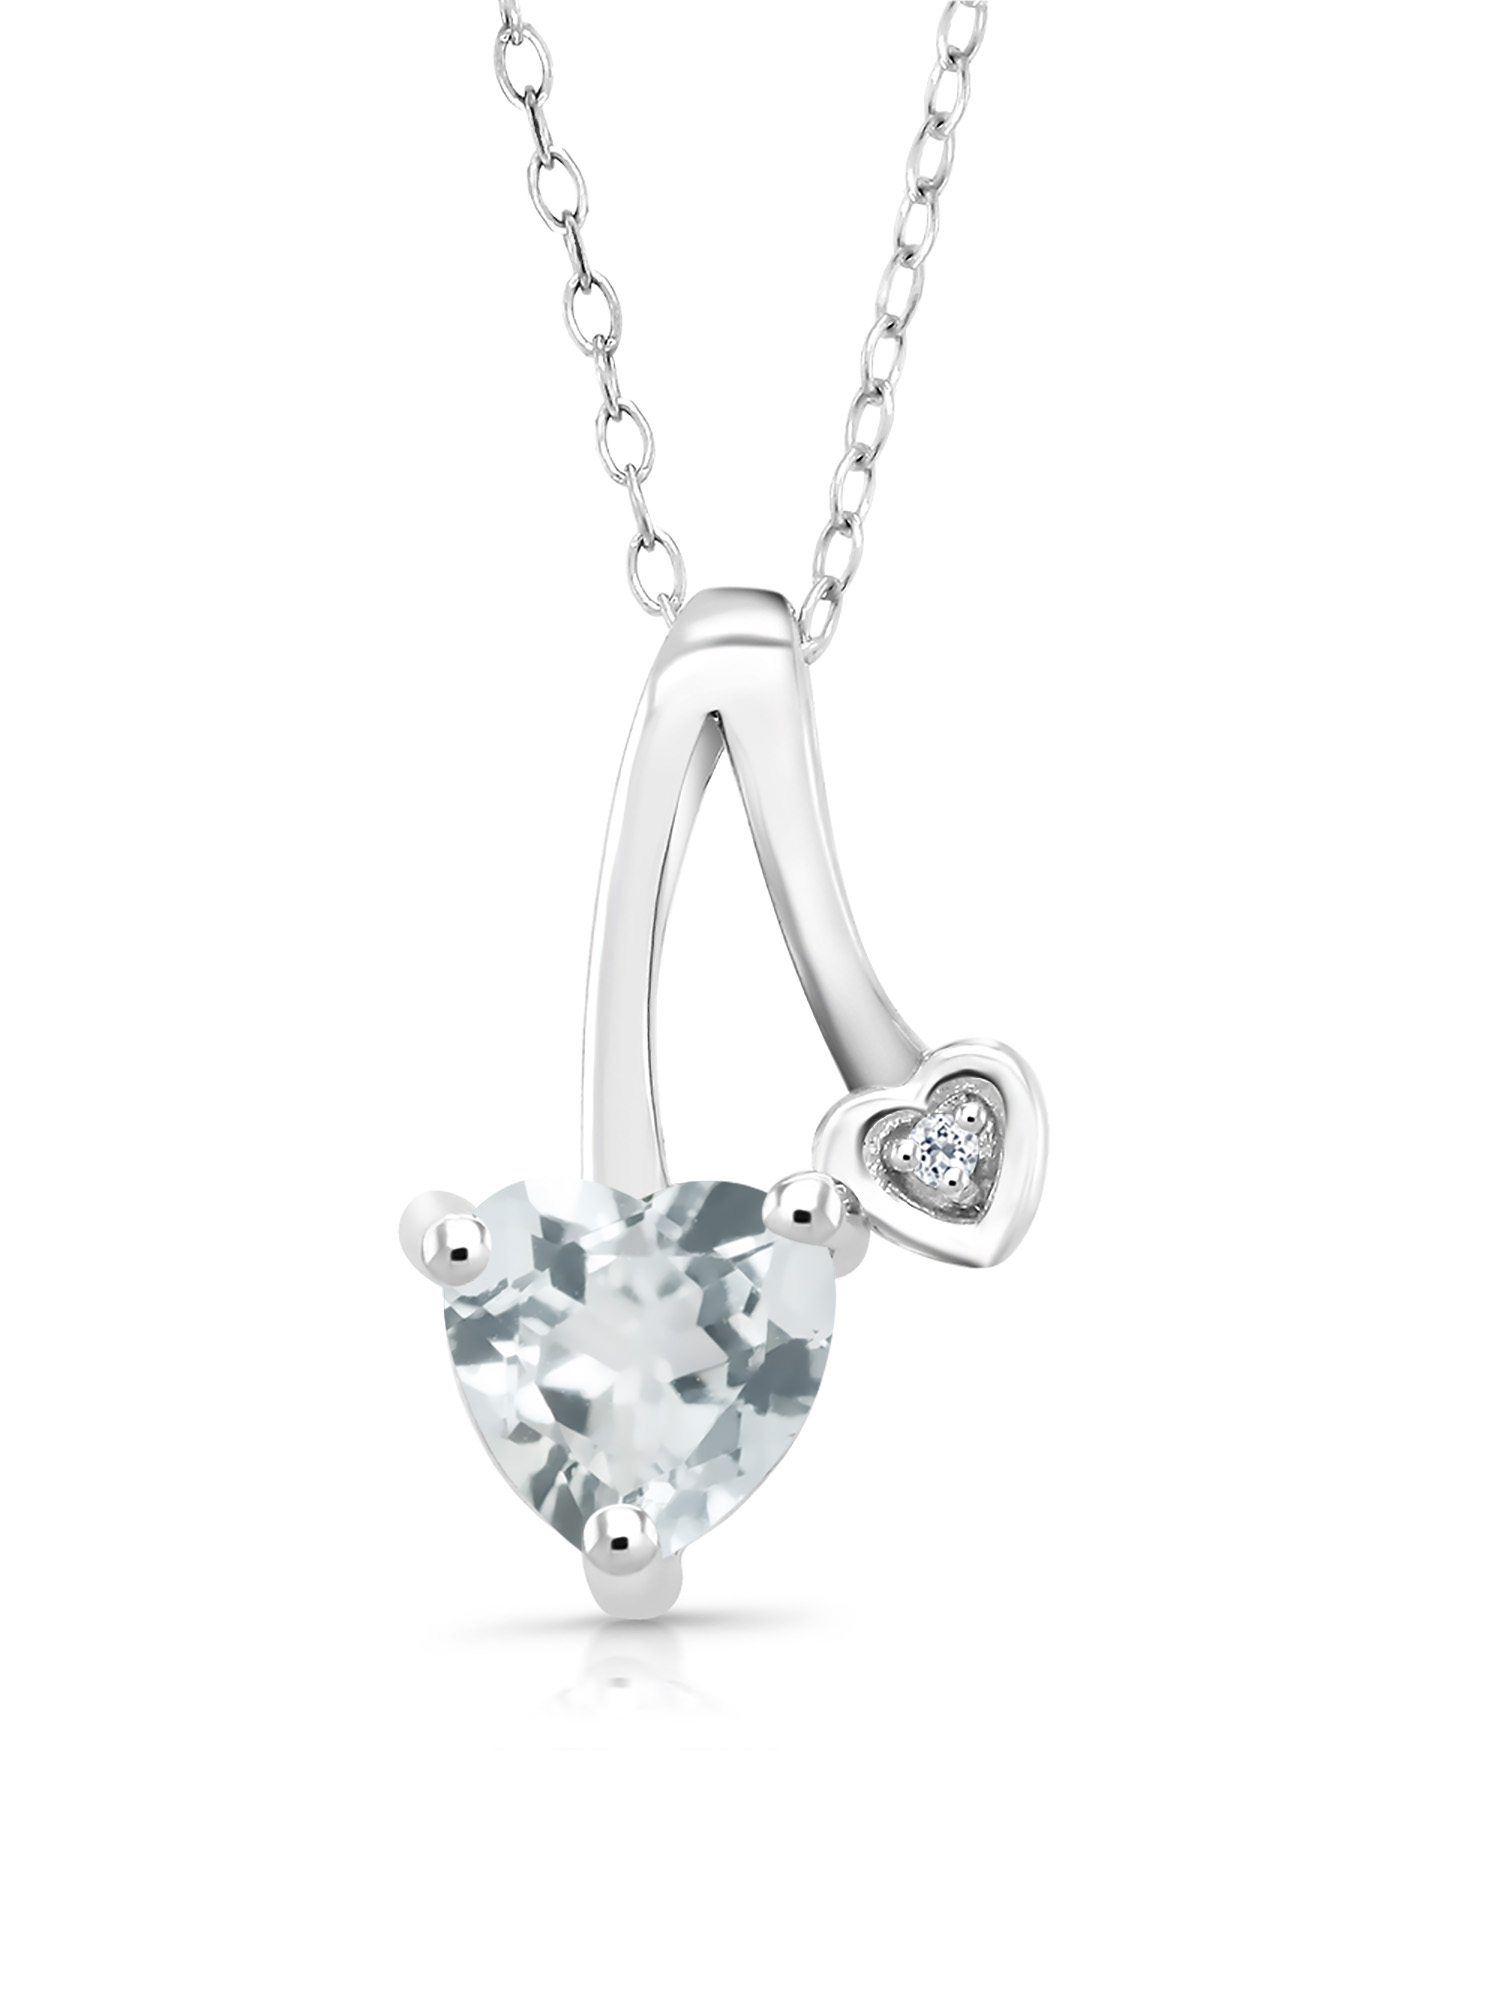 0.68 Ct Heart Shape Sky Blue Aquamarine White Topaz 925 Sterling Silver Pendant by